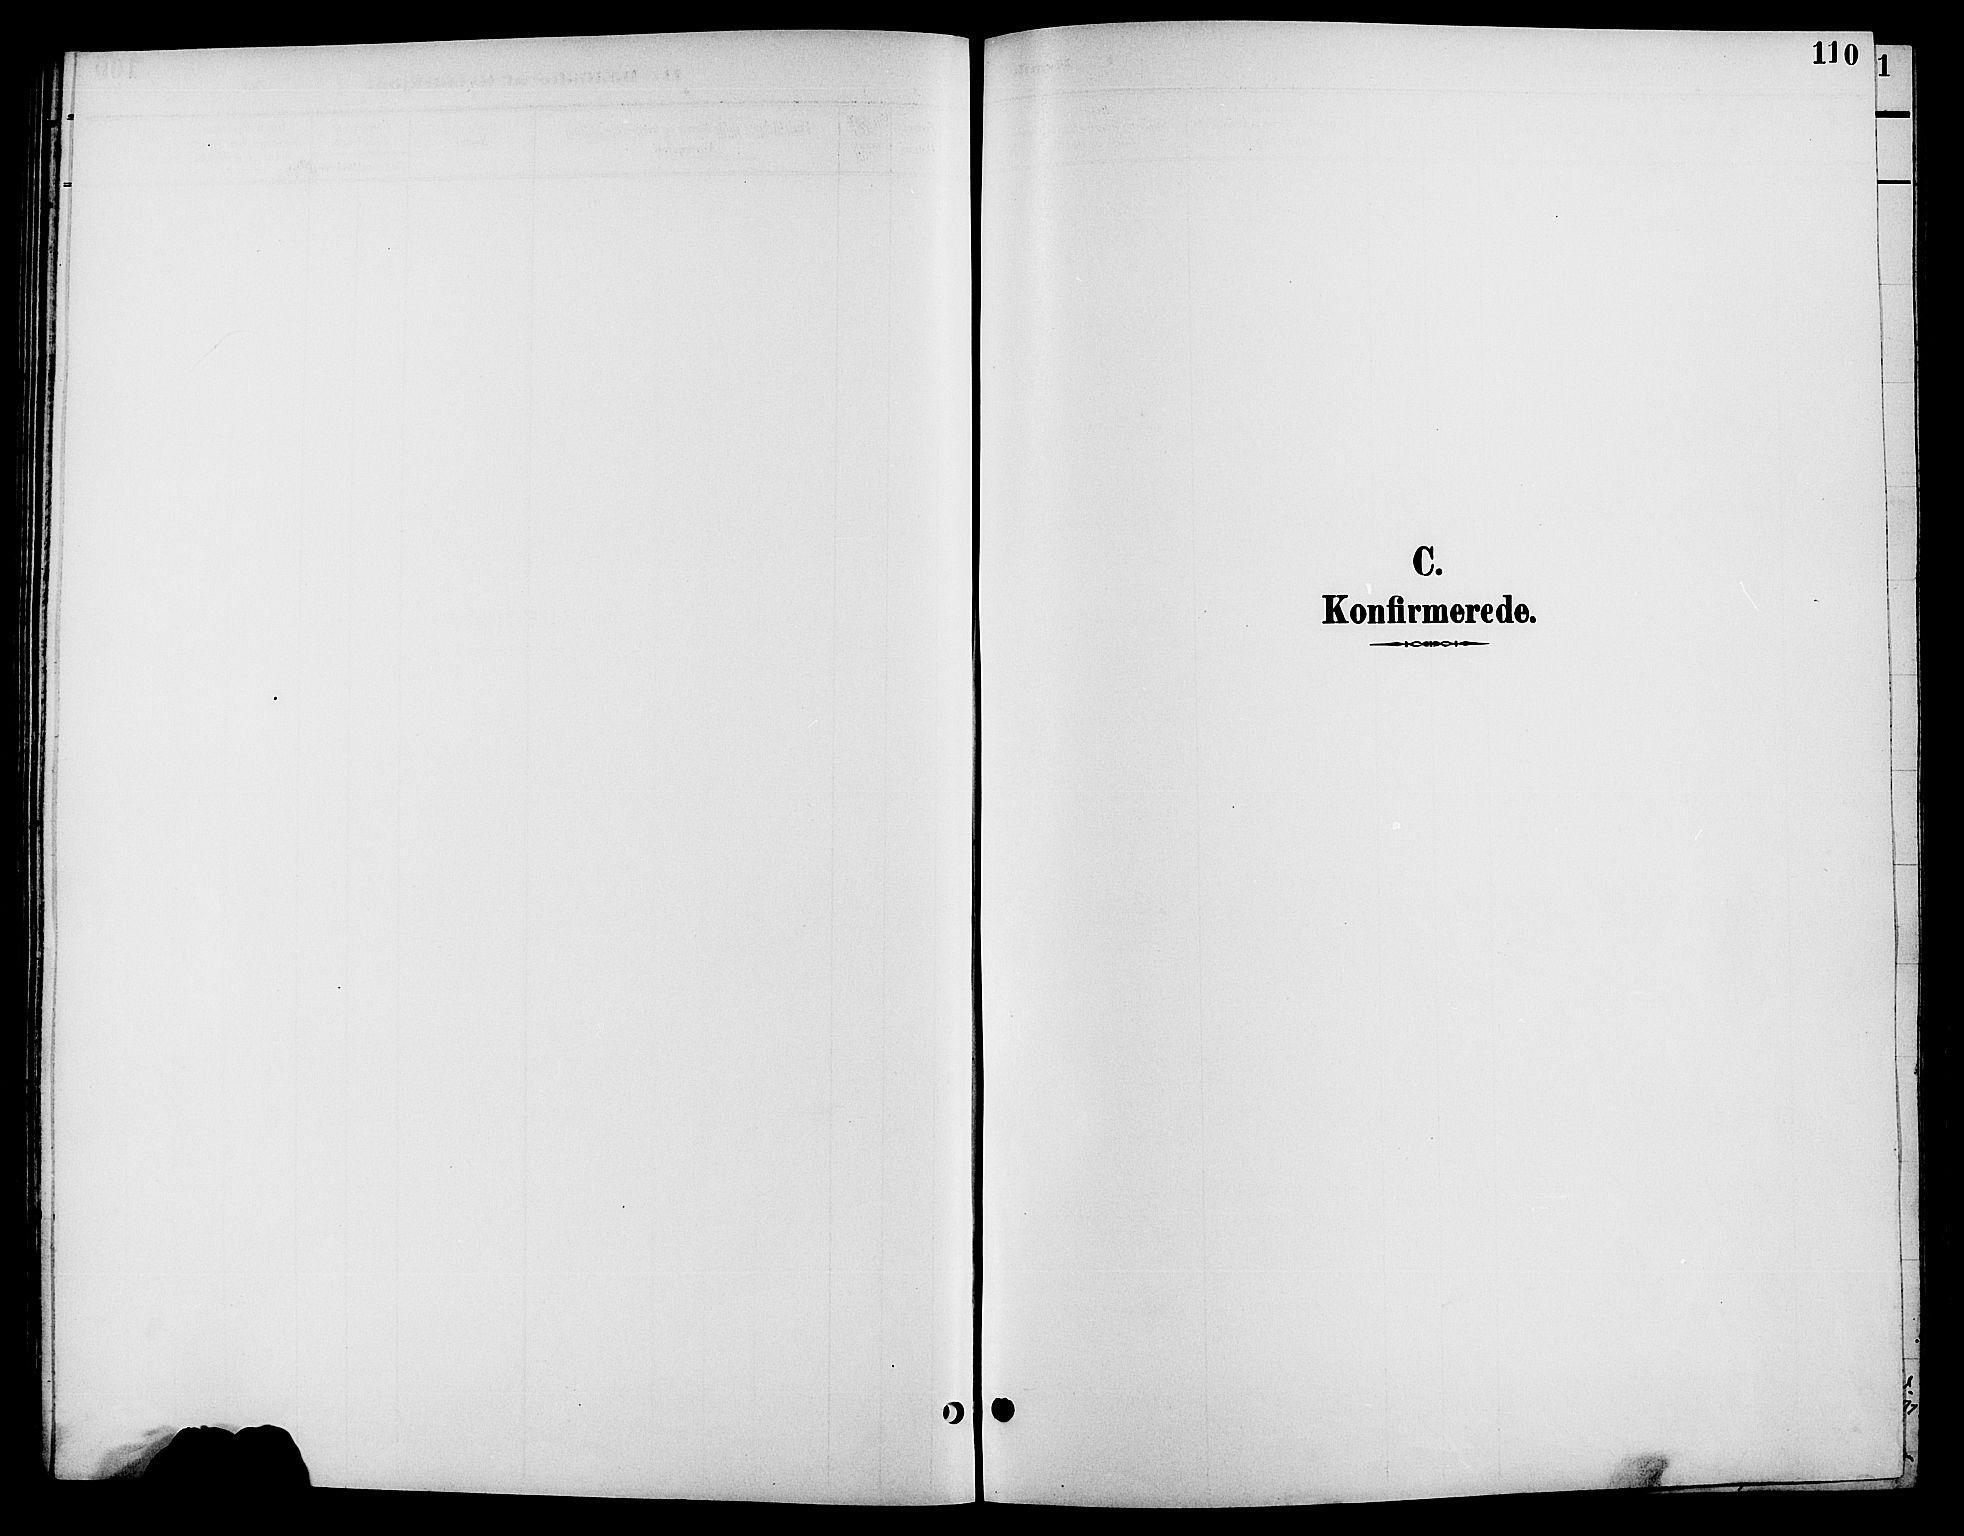 SAH, Biri prestekontor, Klokkerbok nr. 4, 1892-1909, s. 110